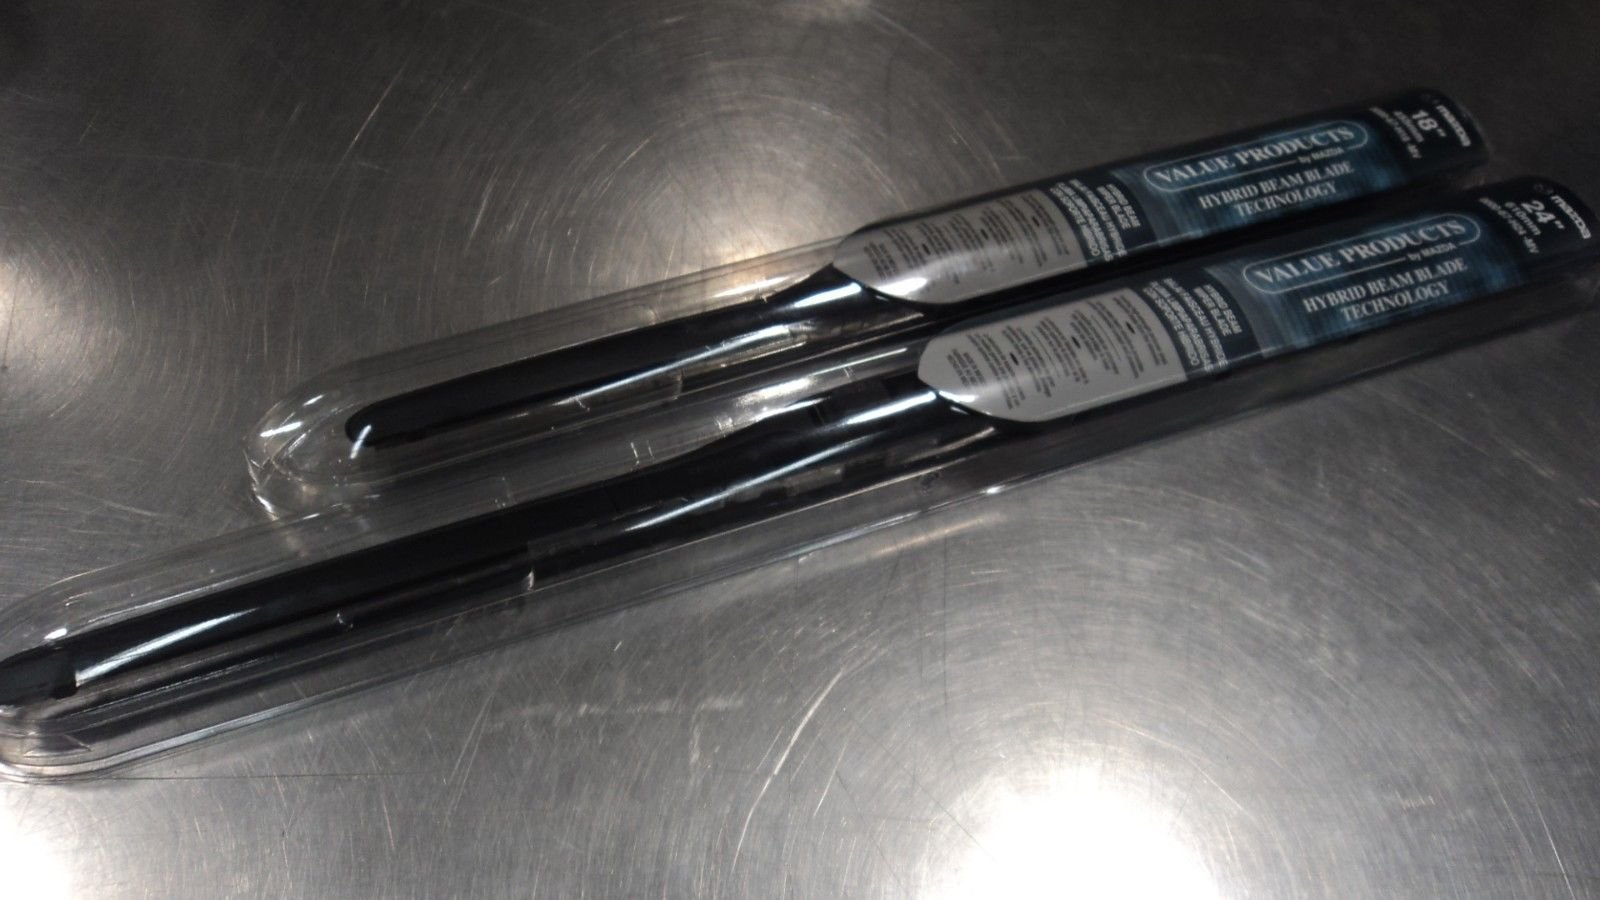 Mazda 3 2014-2015 New OEM Hybrid beam driver & passenger wiper blade set 0000-67-H24-MV, 0000-67-H18-MV